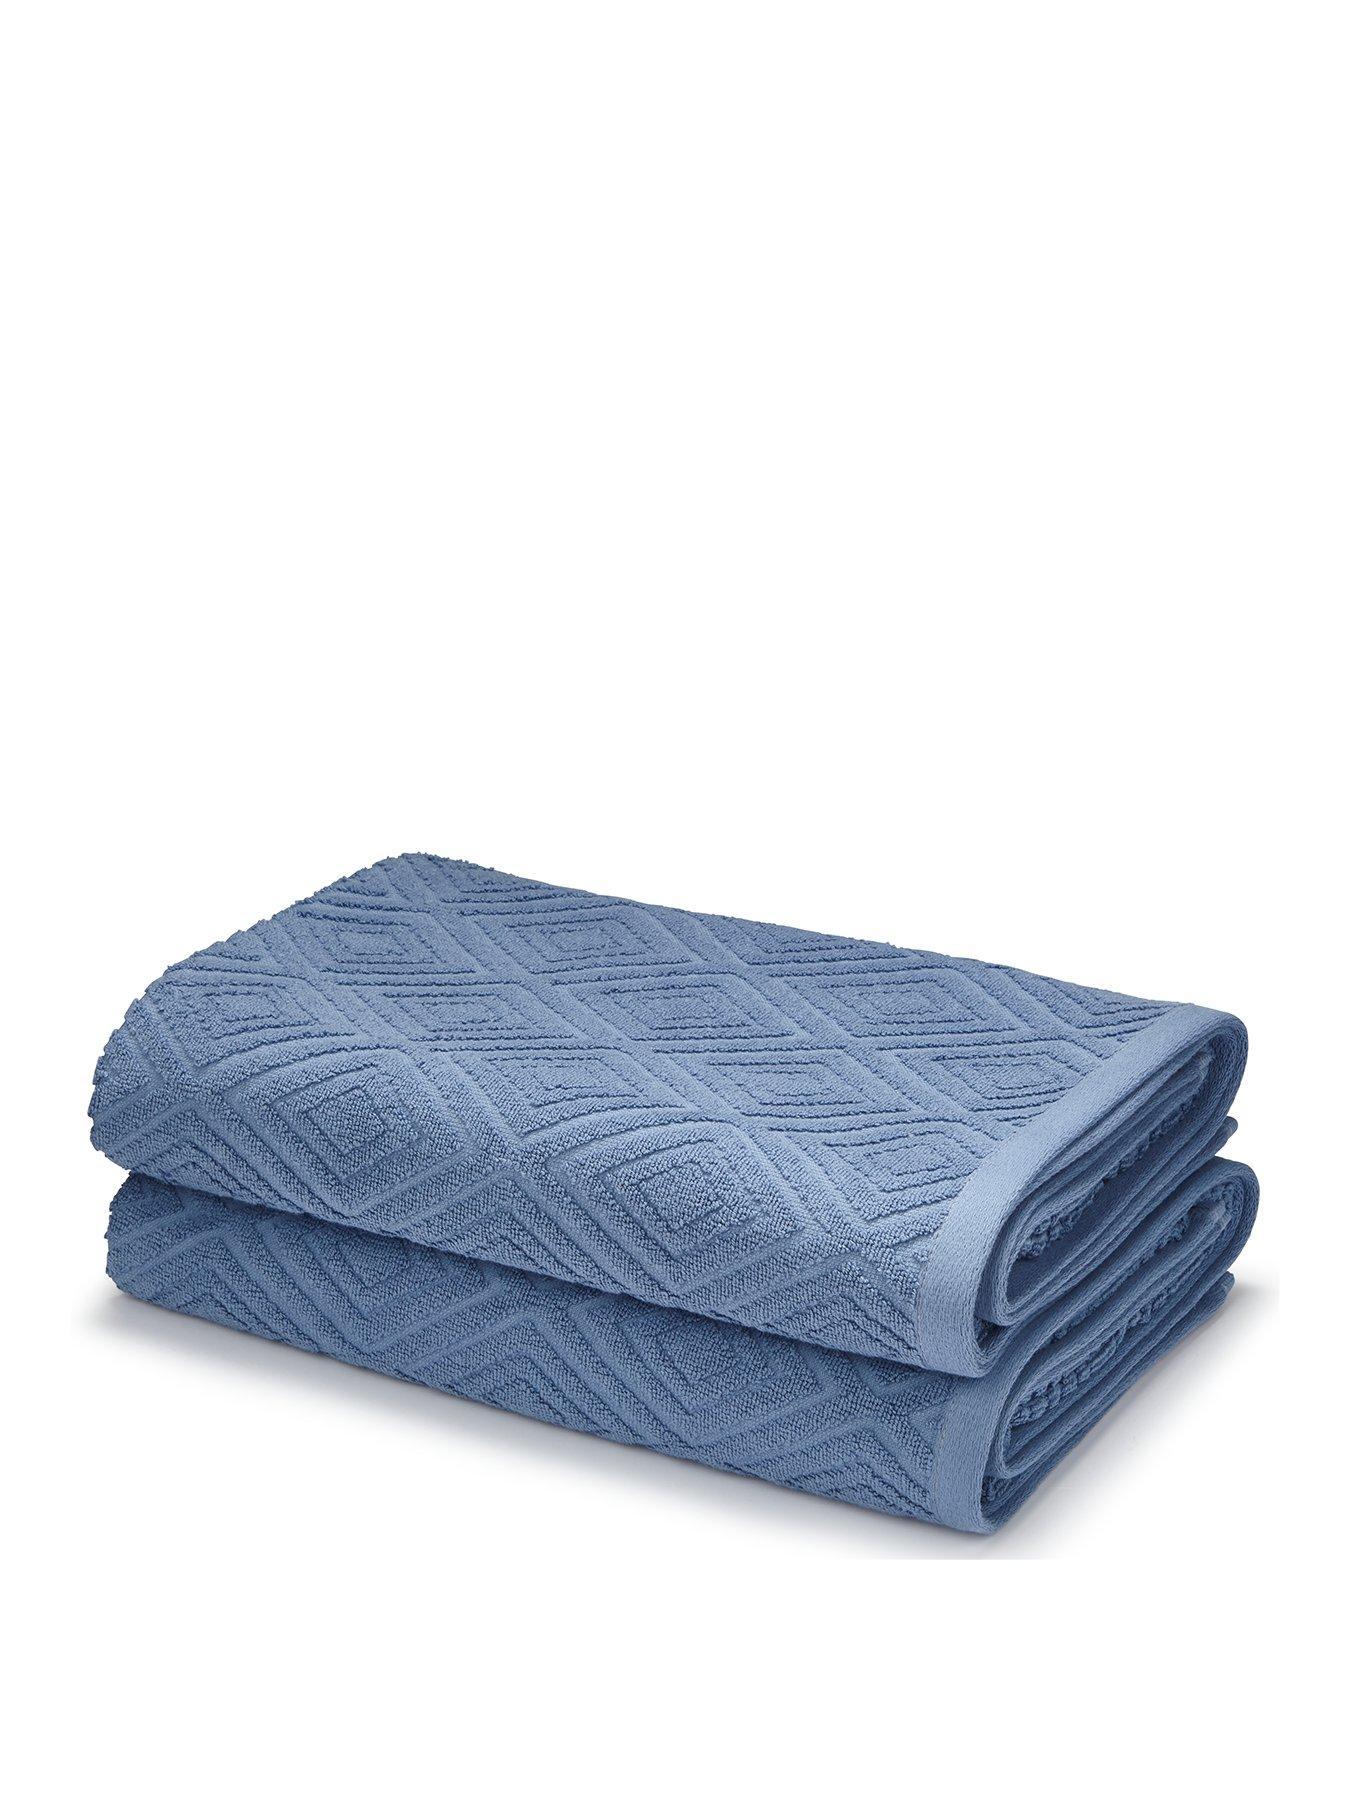 Olivia Rocco Womens Turbie Twist Hair Towel Wrap Drying Towel Turban Soft Bath Loop Fasten Black